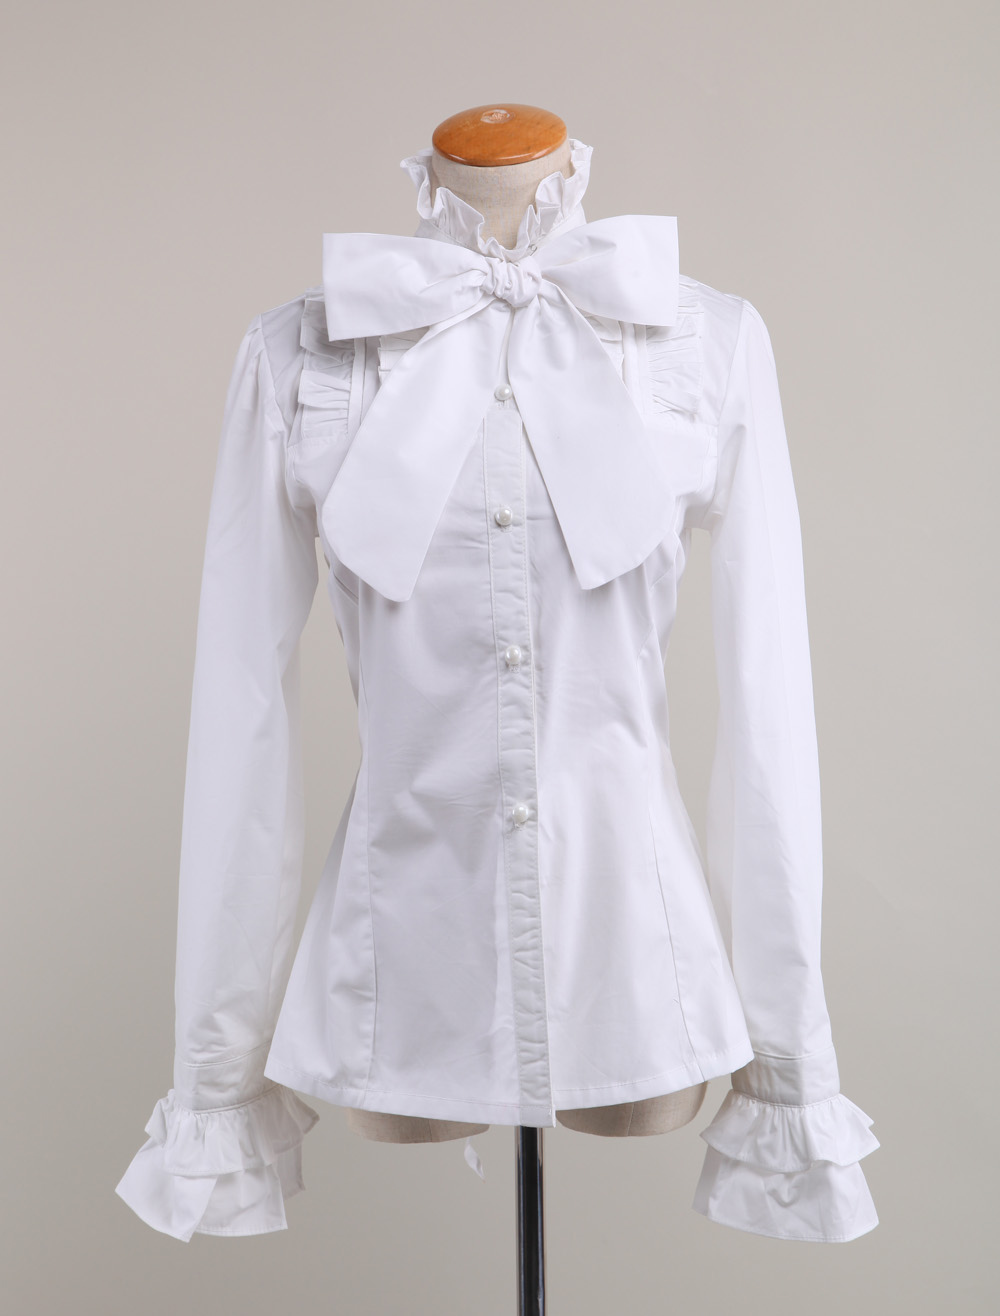 Cotton White Long Sleeves Bow Cotton Lolita Blouse